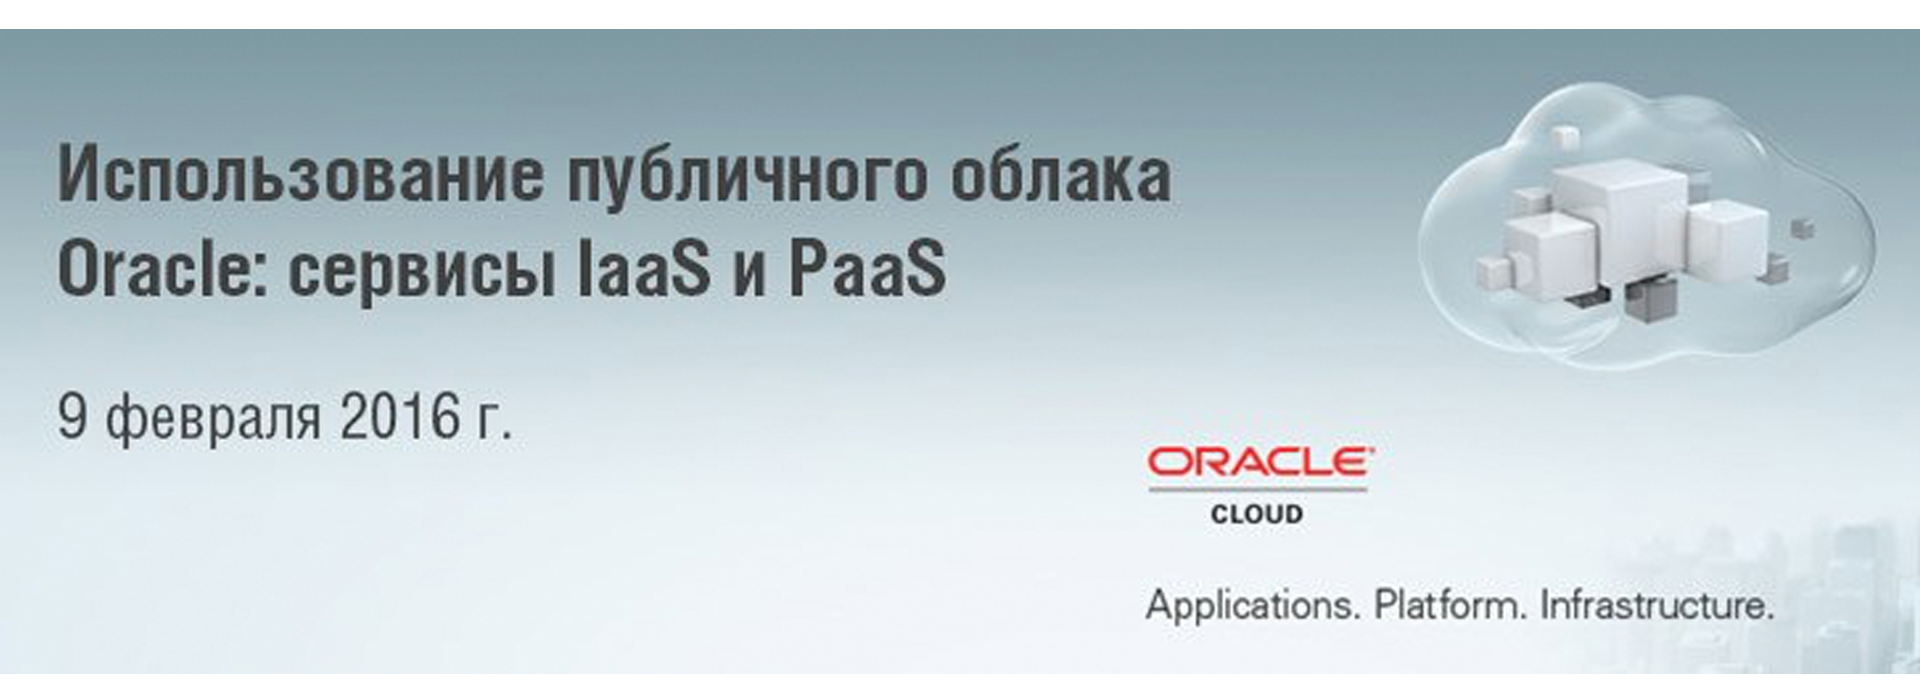 Регистрация на вебинар «Использование публичного облака Oracle: сервисы IaaS и PaaS»